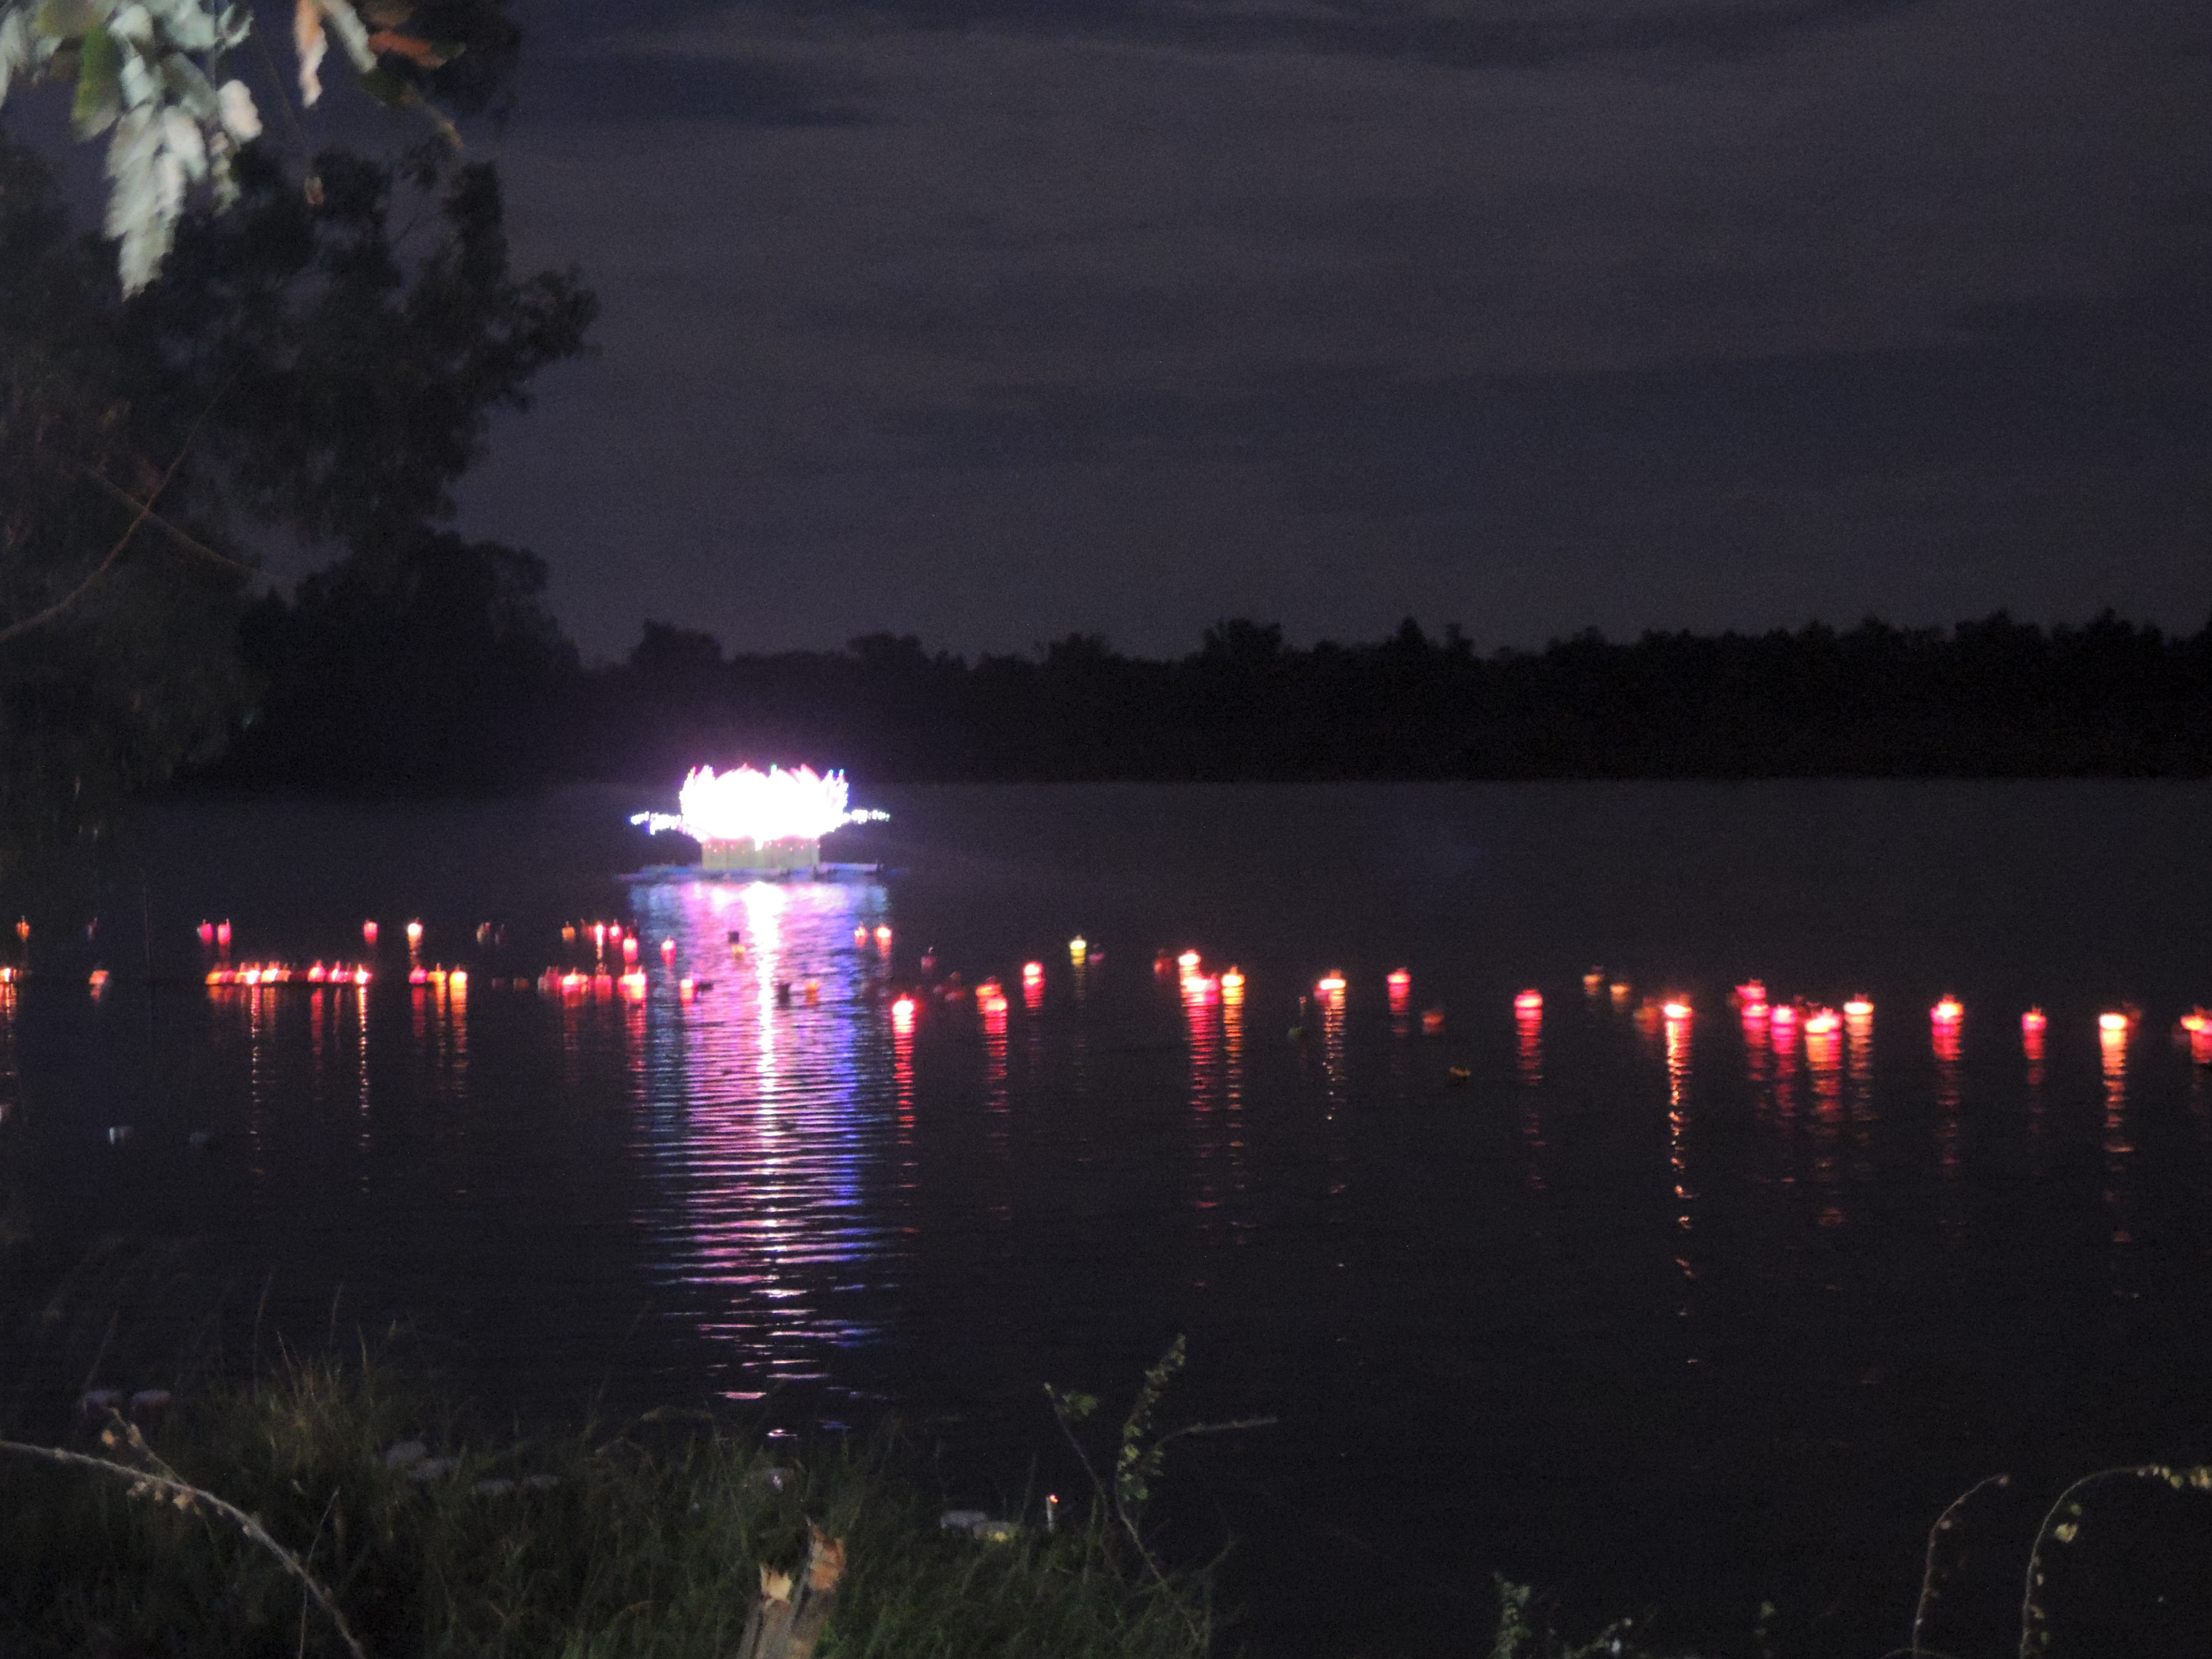 Loi Krathong Festival - Things to do in Chiang Mai